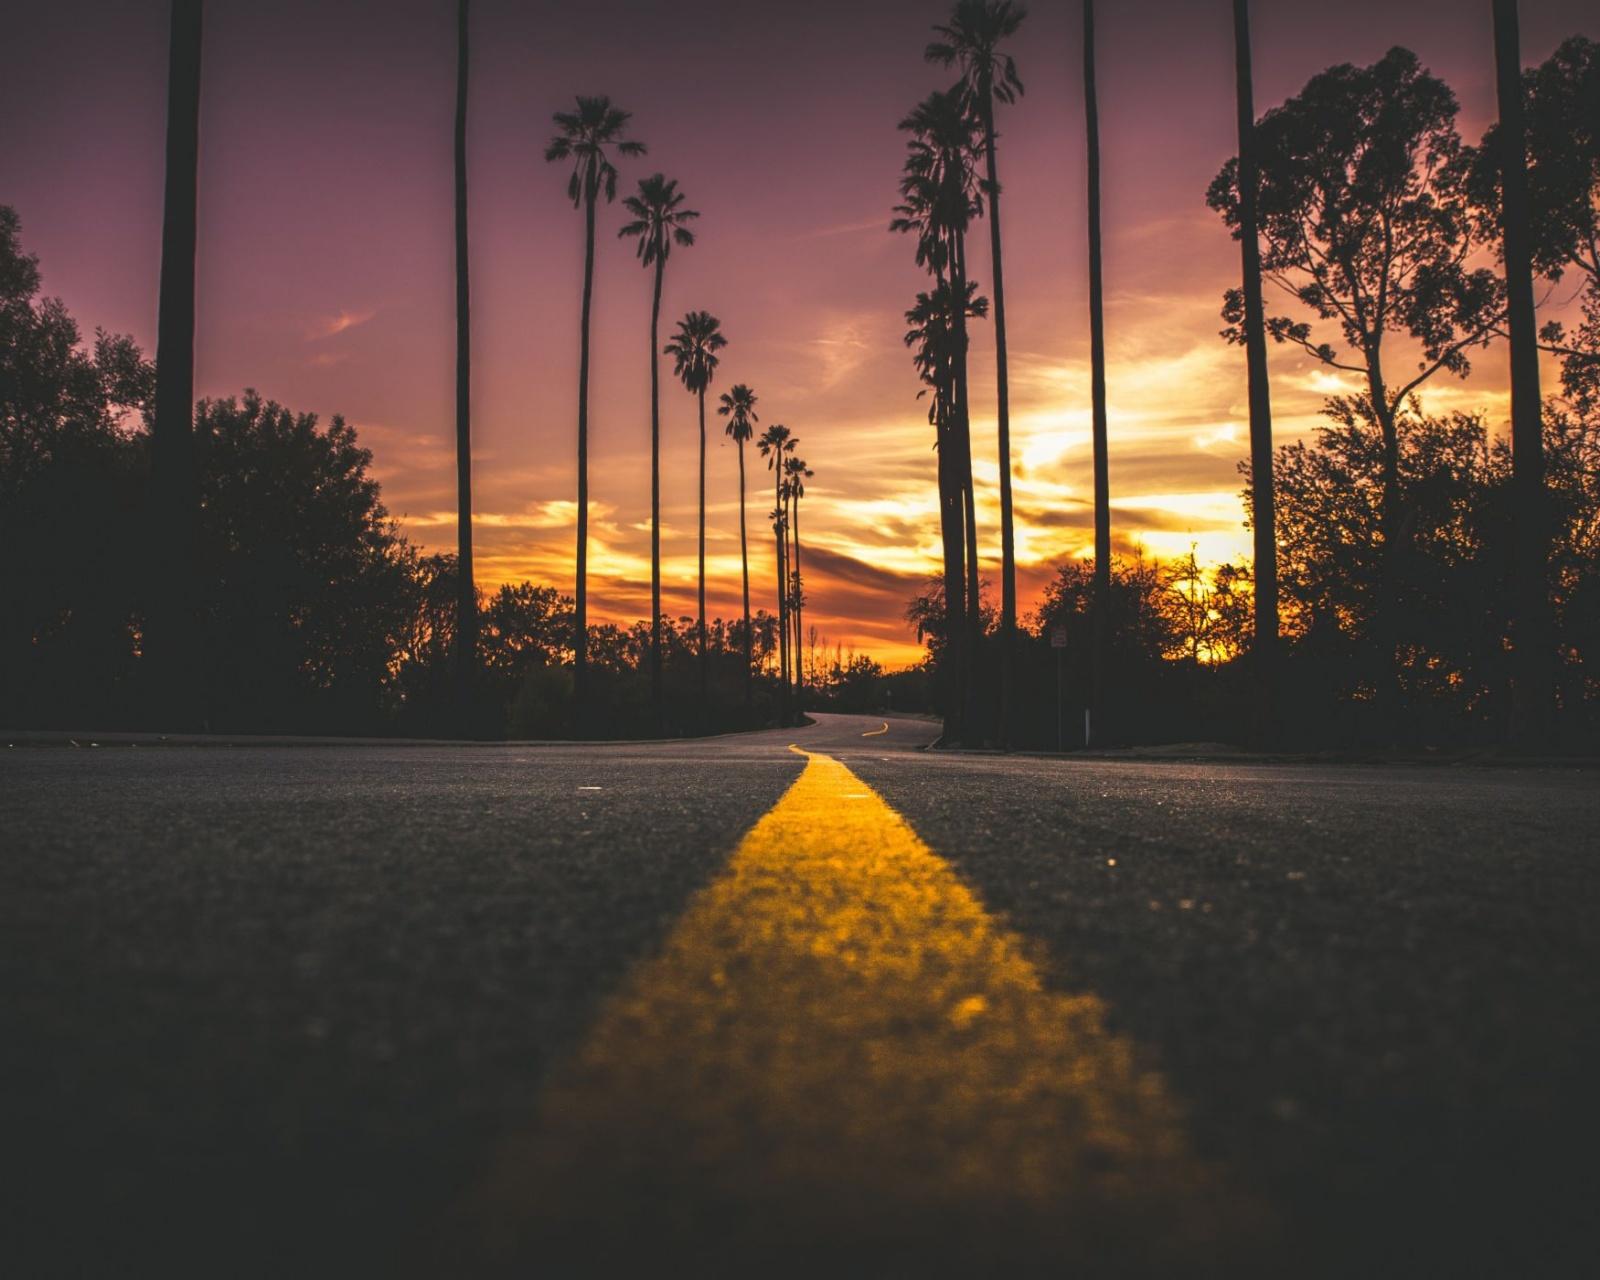 City Dark Dawn Dusk Evening Landscape Light Pavement Road Silhouette Street Sun Sunset Travel Trees Wallpaper